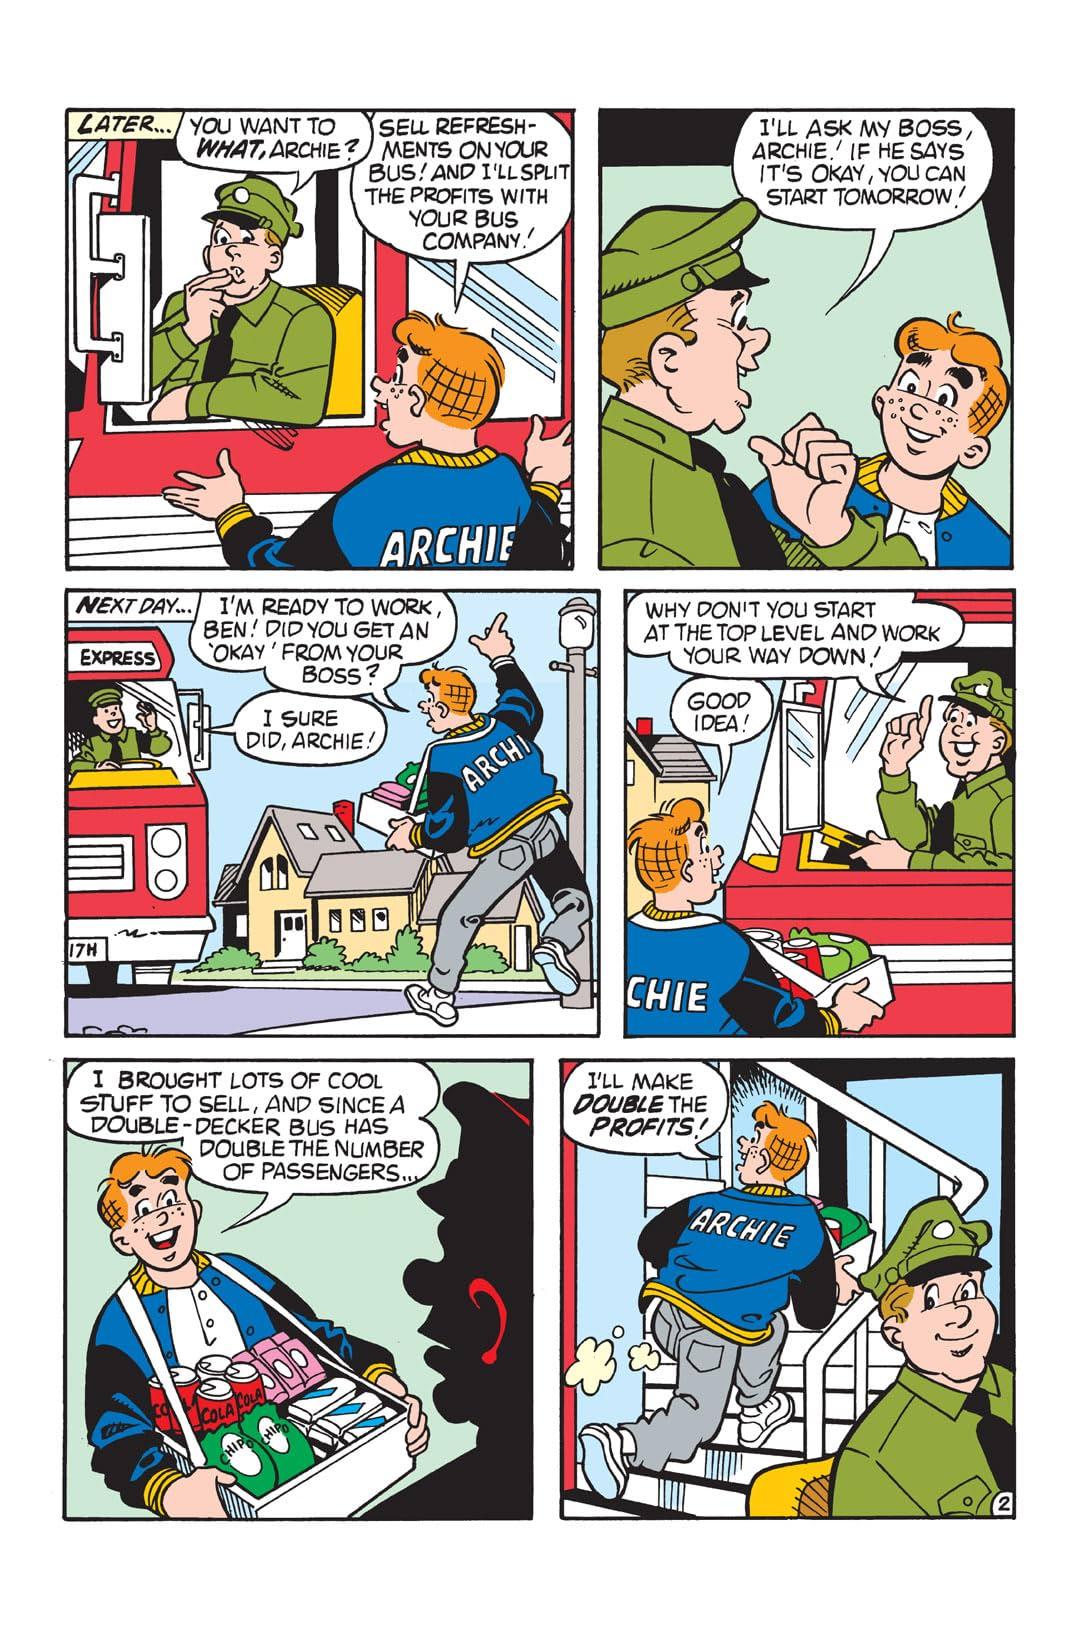 Archie #495